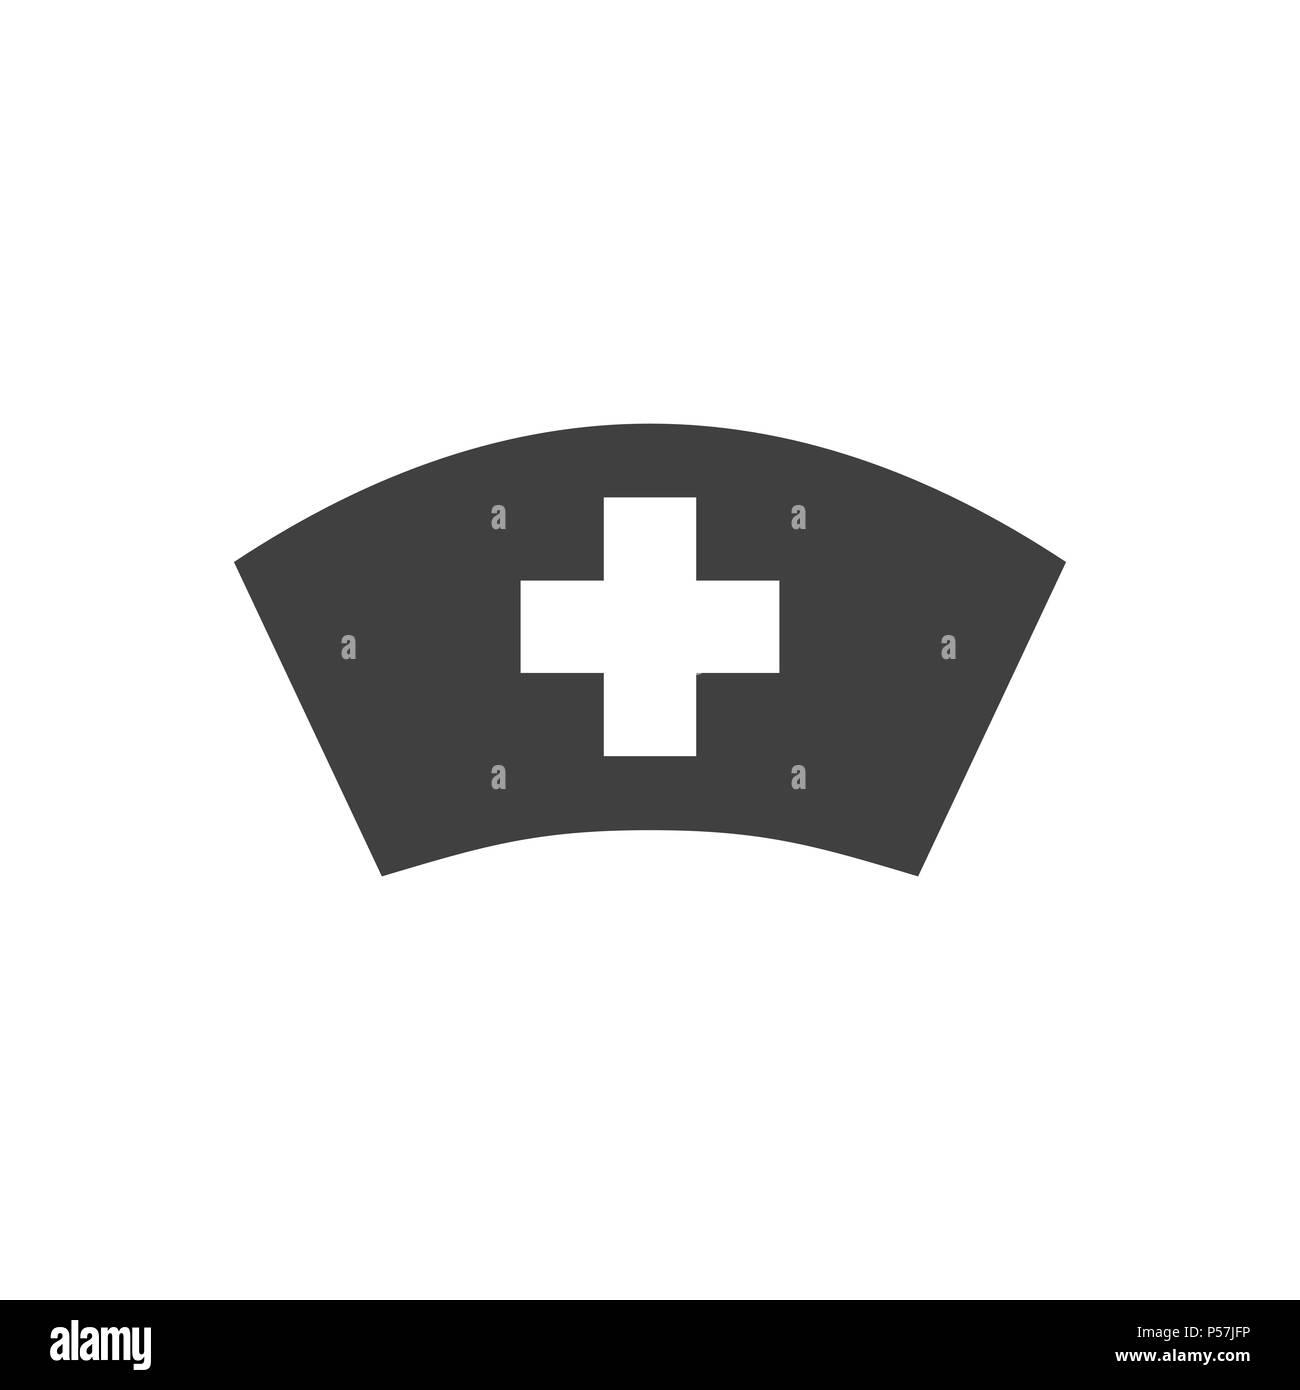 Nurse Hat Vector Icon Stock Vector Art Illustration